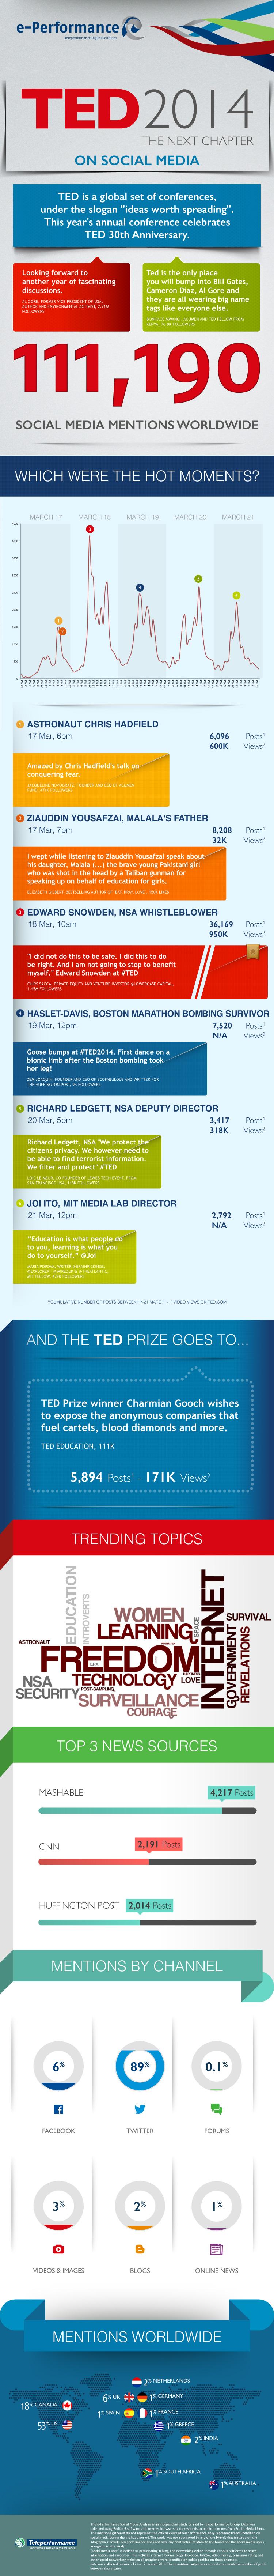 TED2014 infografic teleperformance